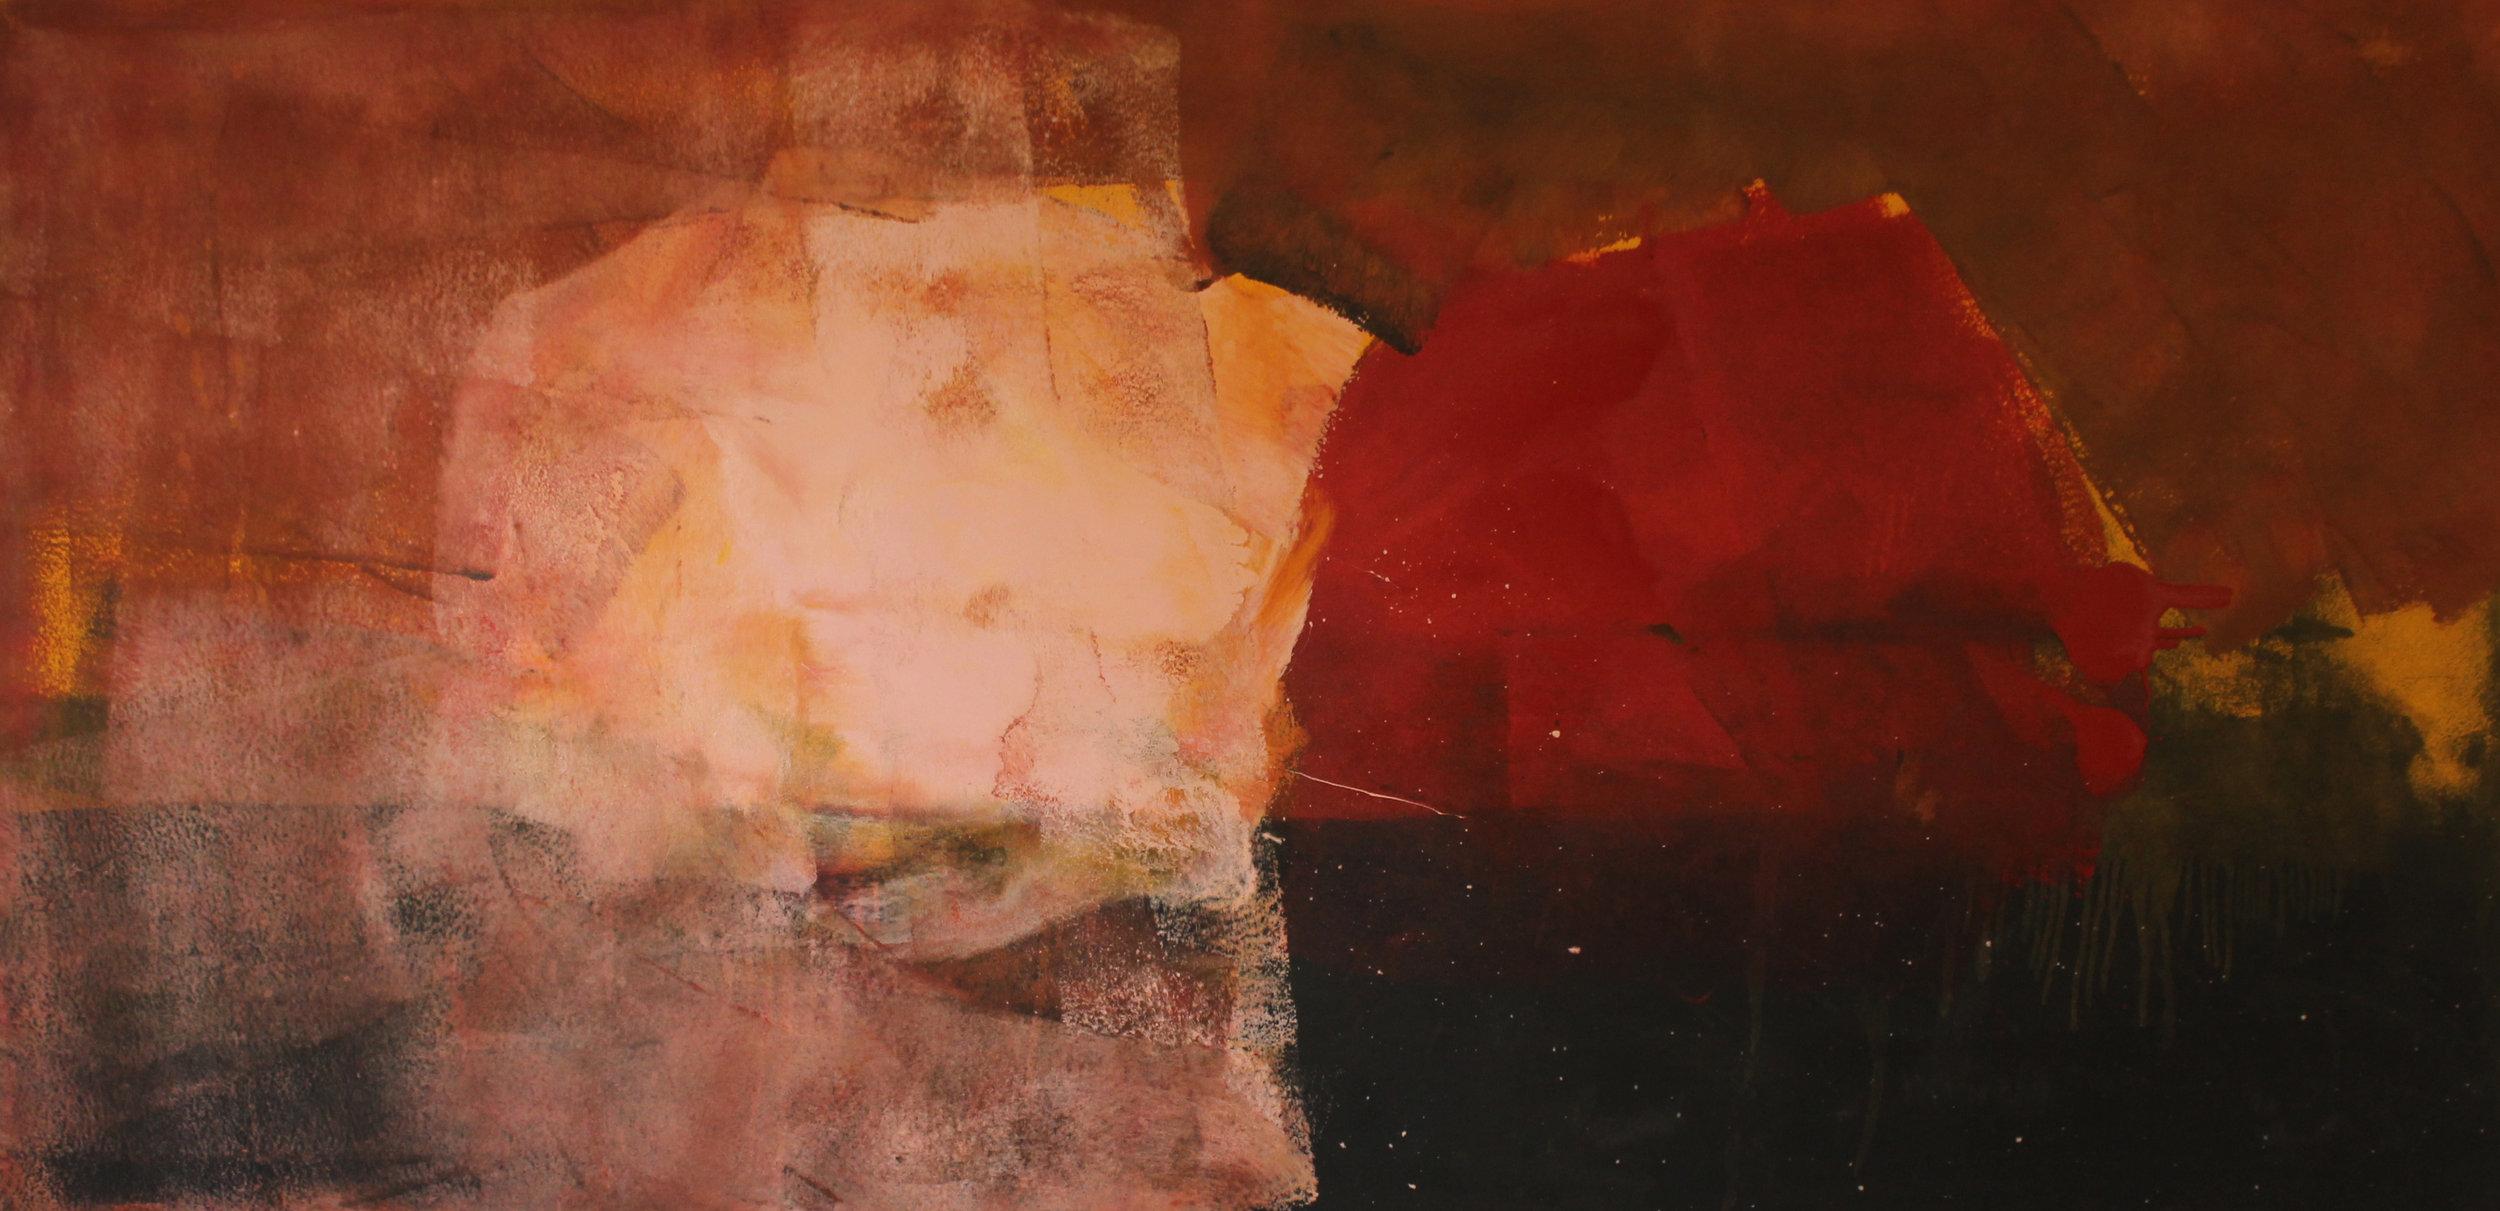 Untitled, 2014, enamel paint on canvas, 122 x 244 cm